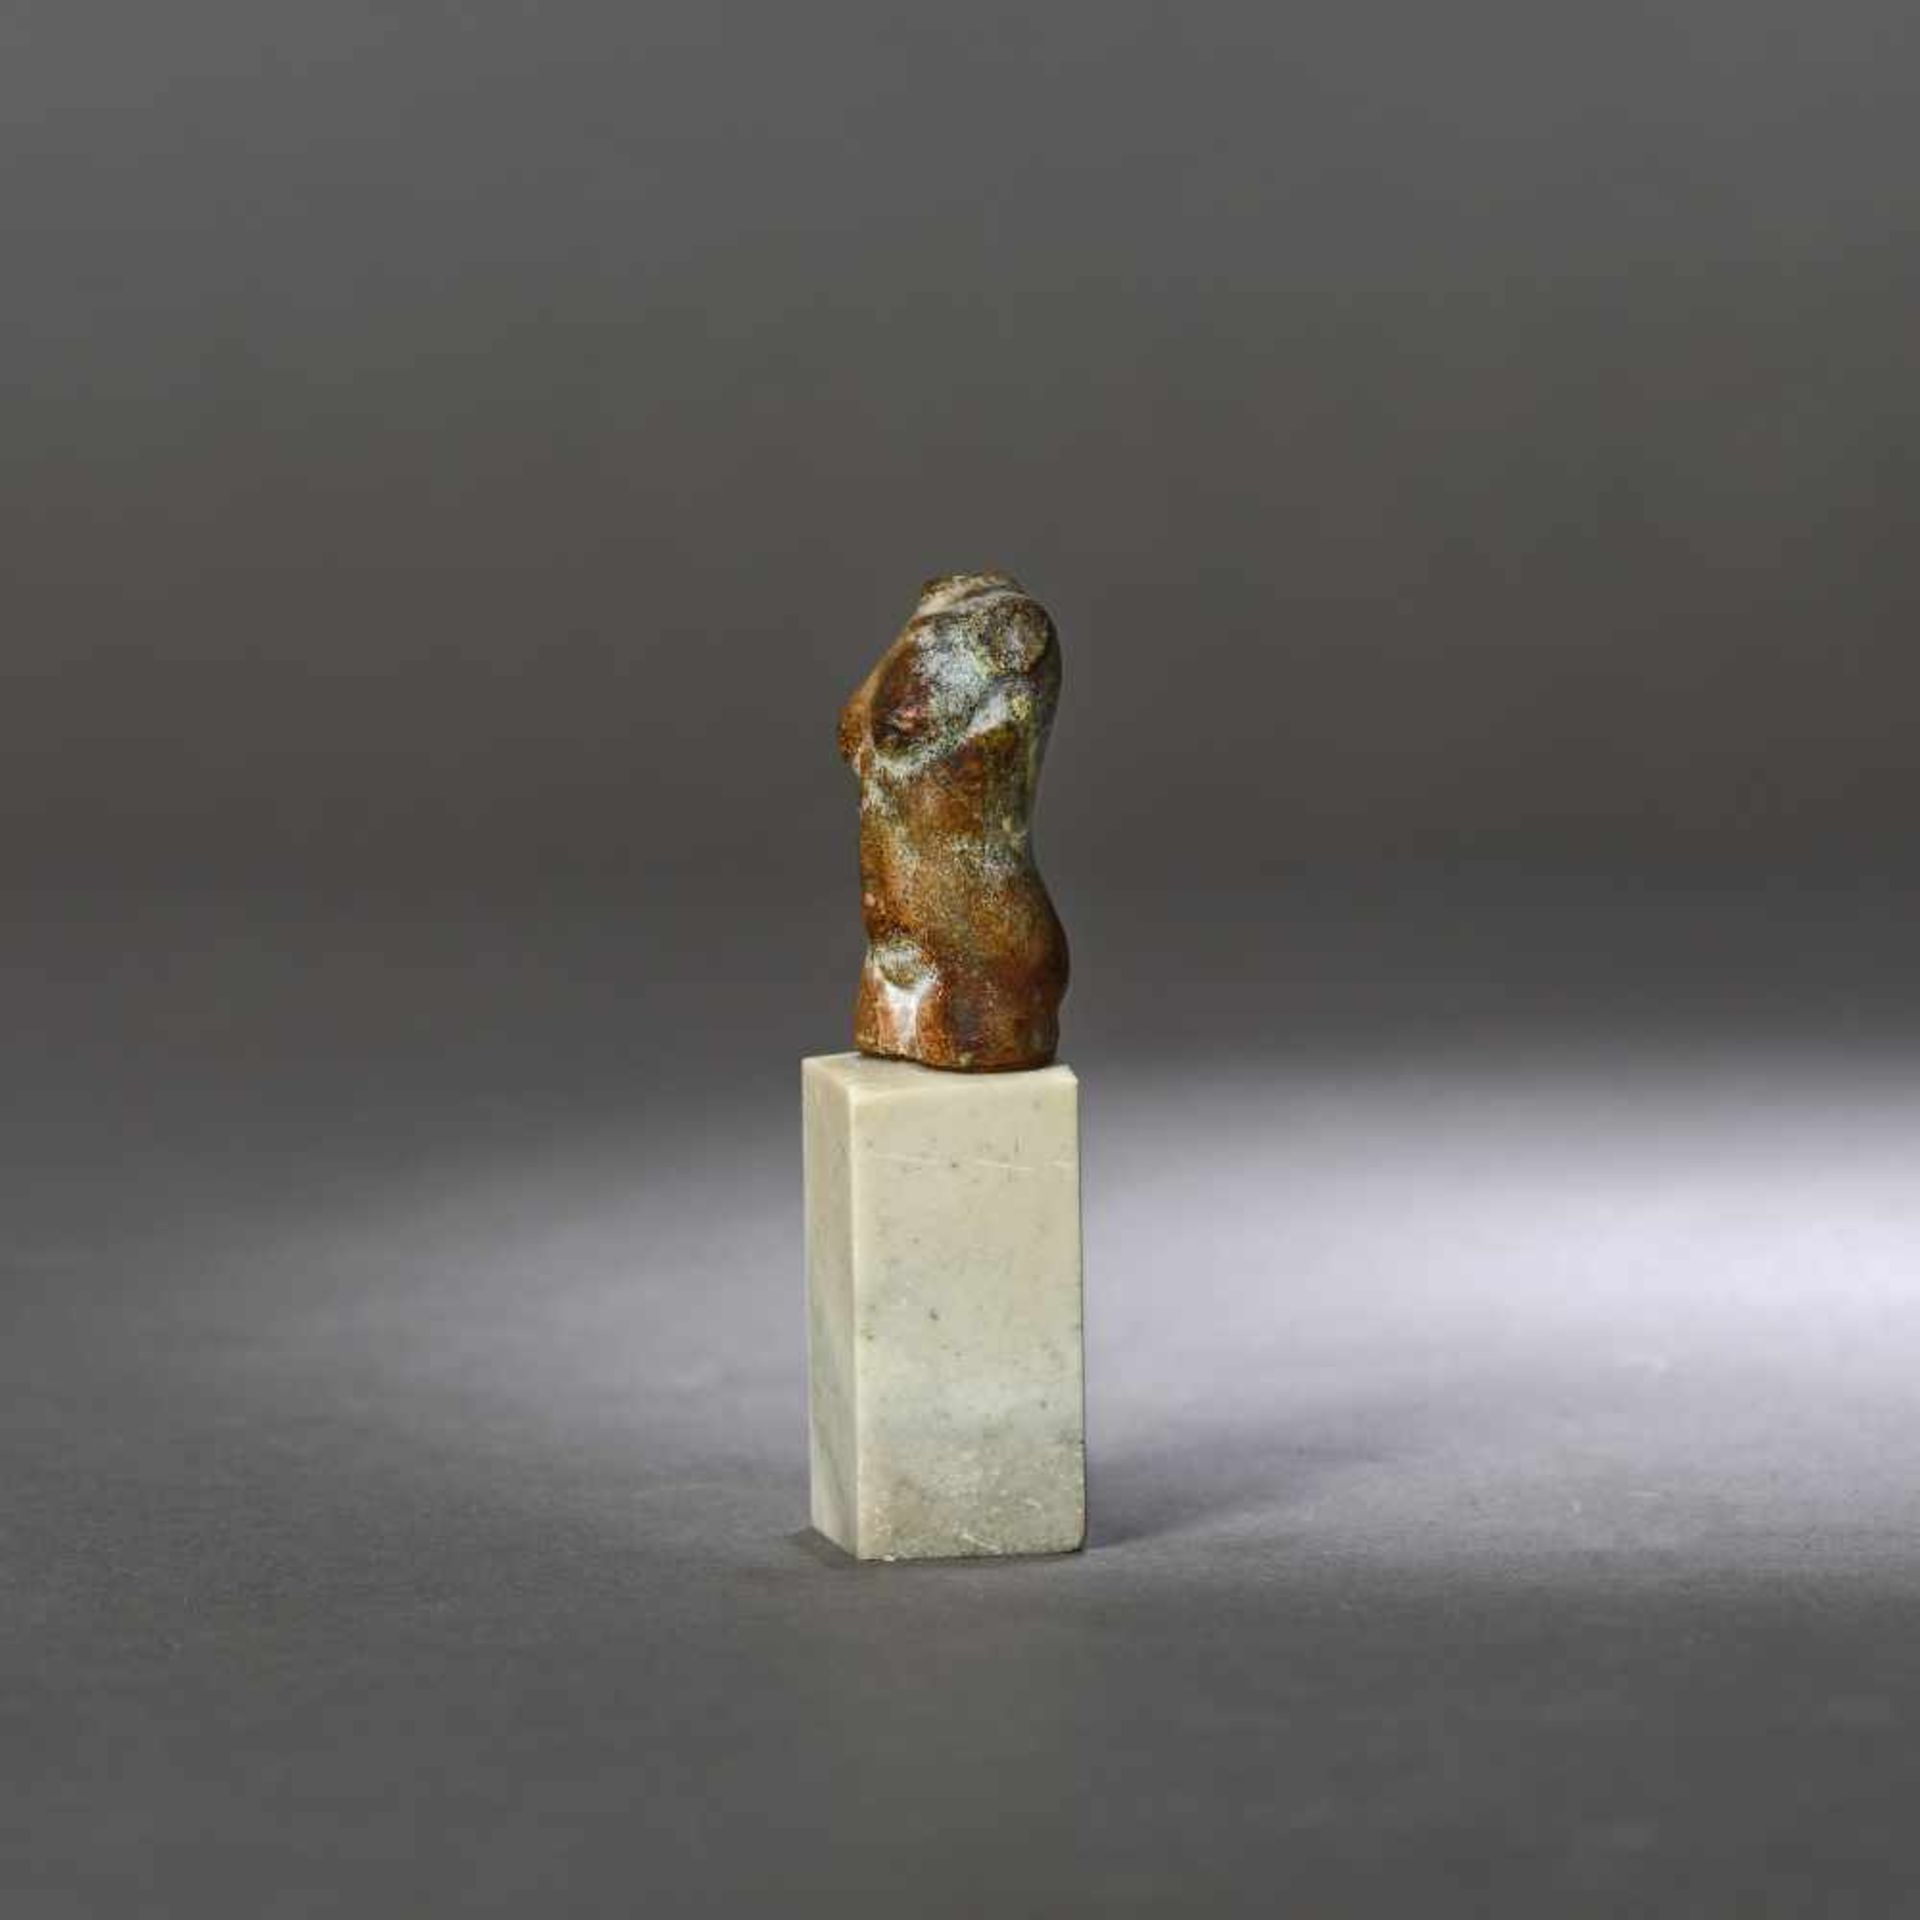 Miniature stone statuette, representing a torso of the goddess Venus, the goddess of beauty, possibl - Bild 2 aus 3